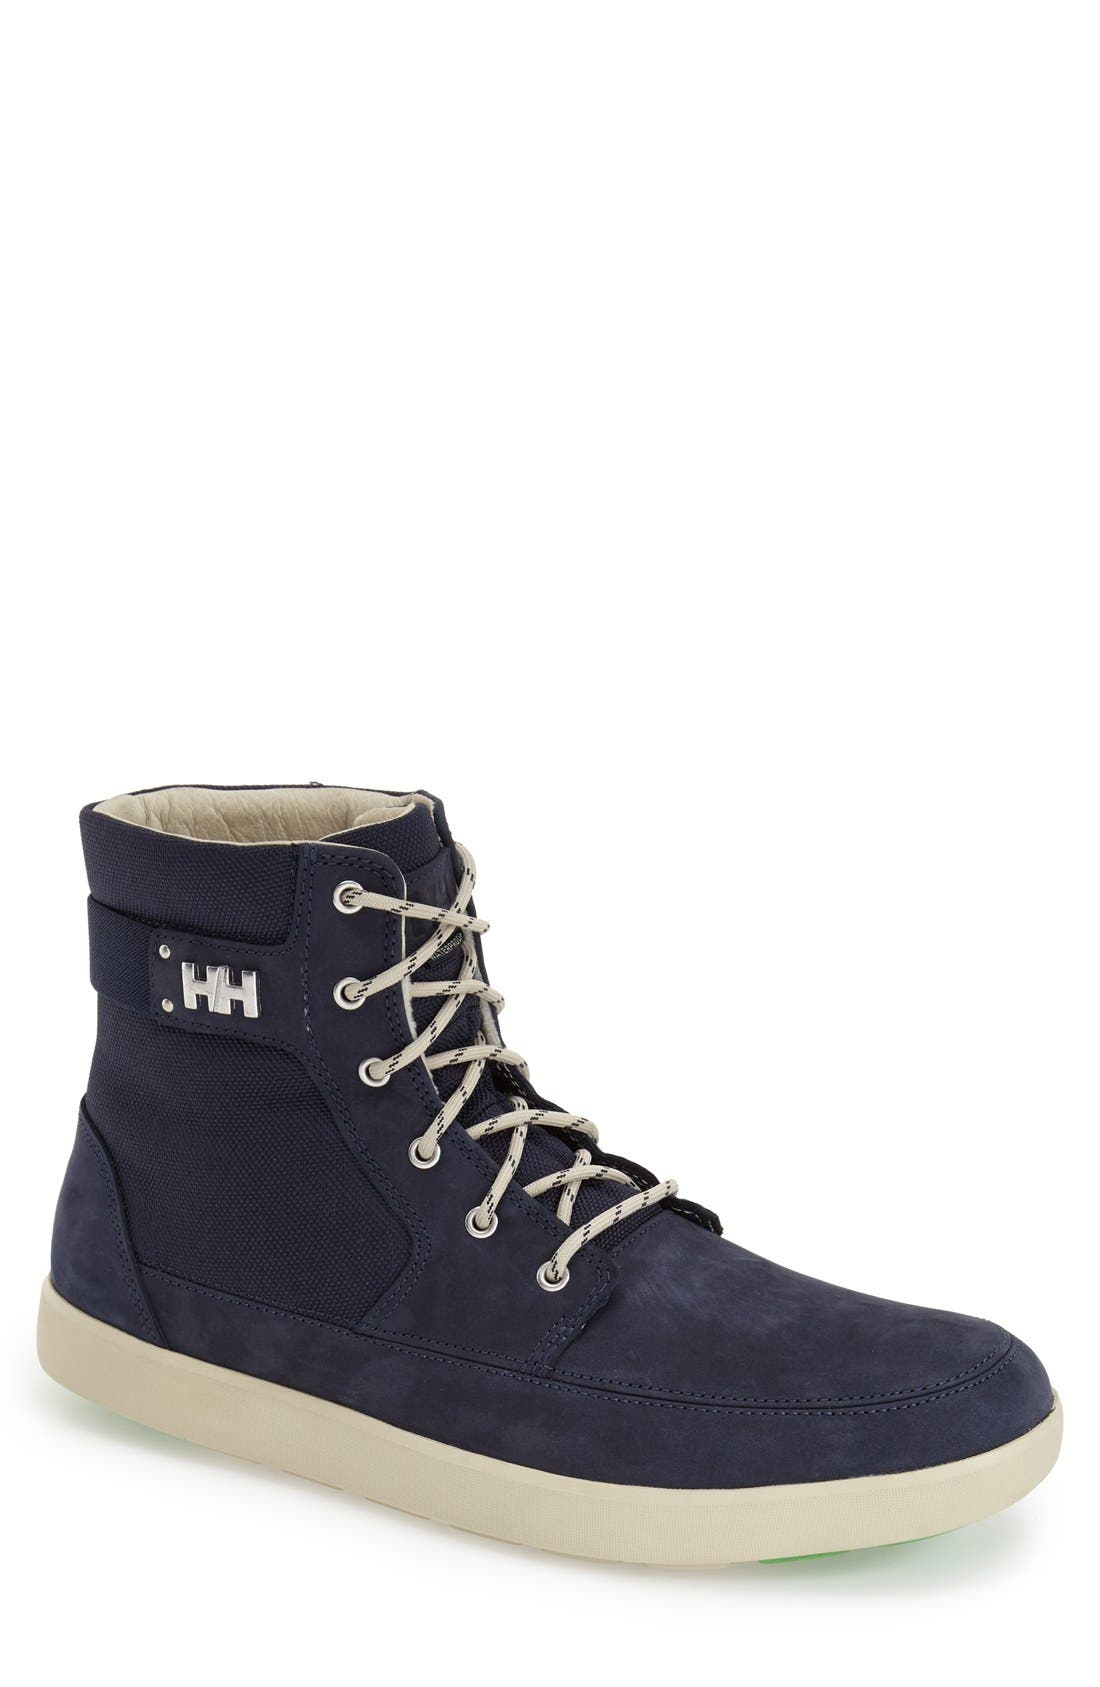 'Stockholm' Waterproof High Top Sneaker,                             Main thumbnail 1, color,                             489